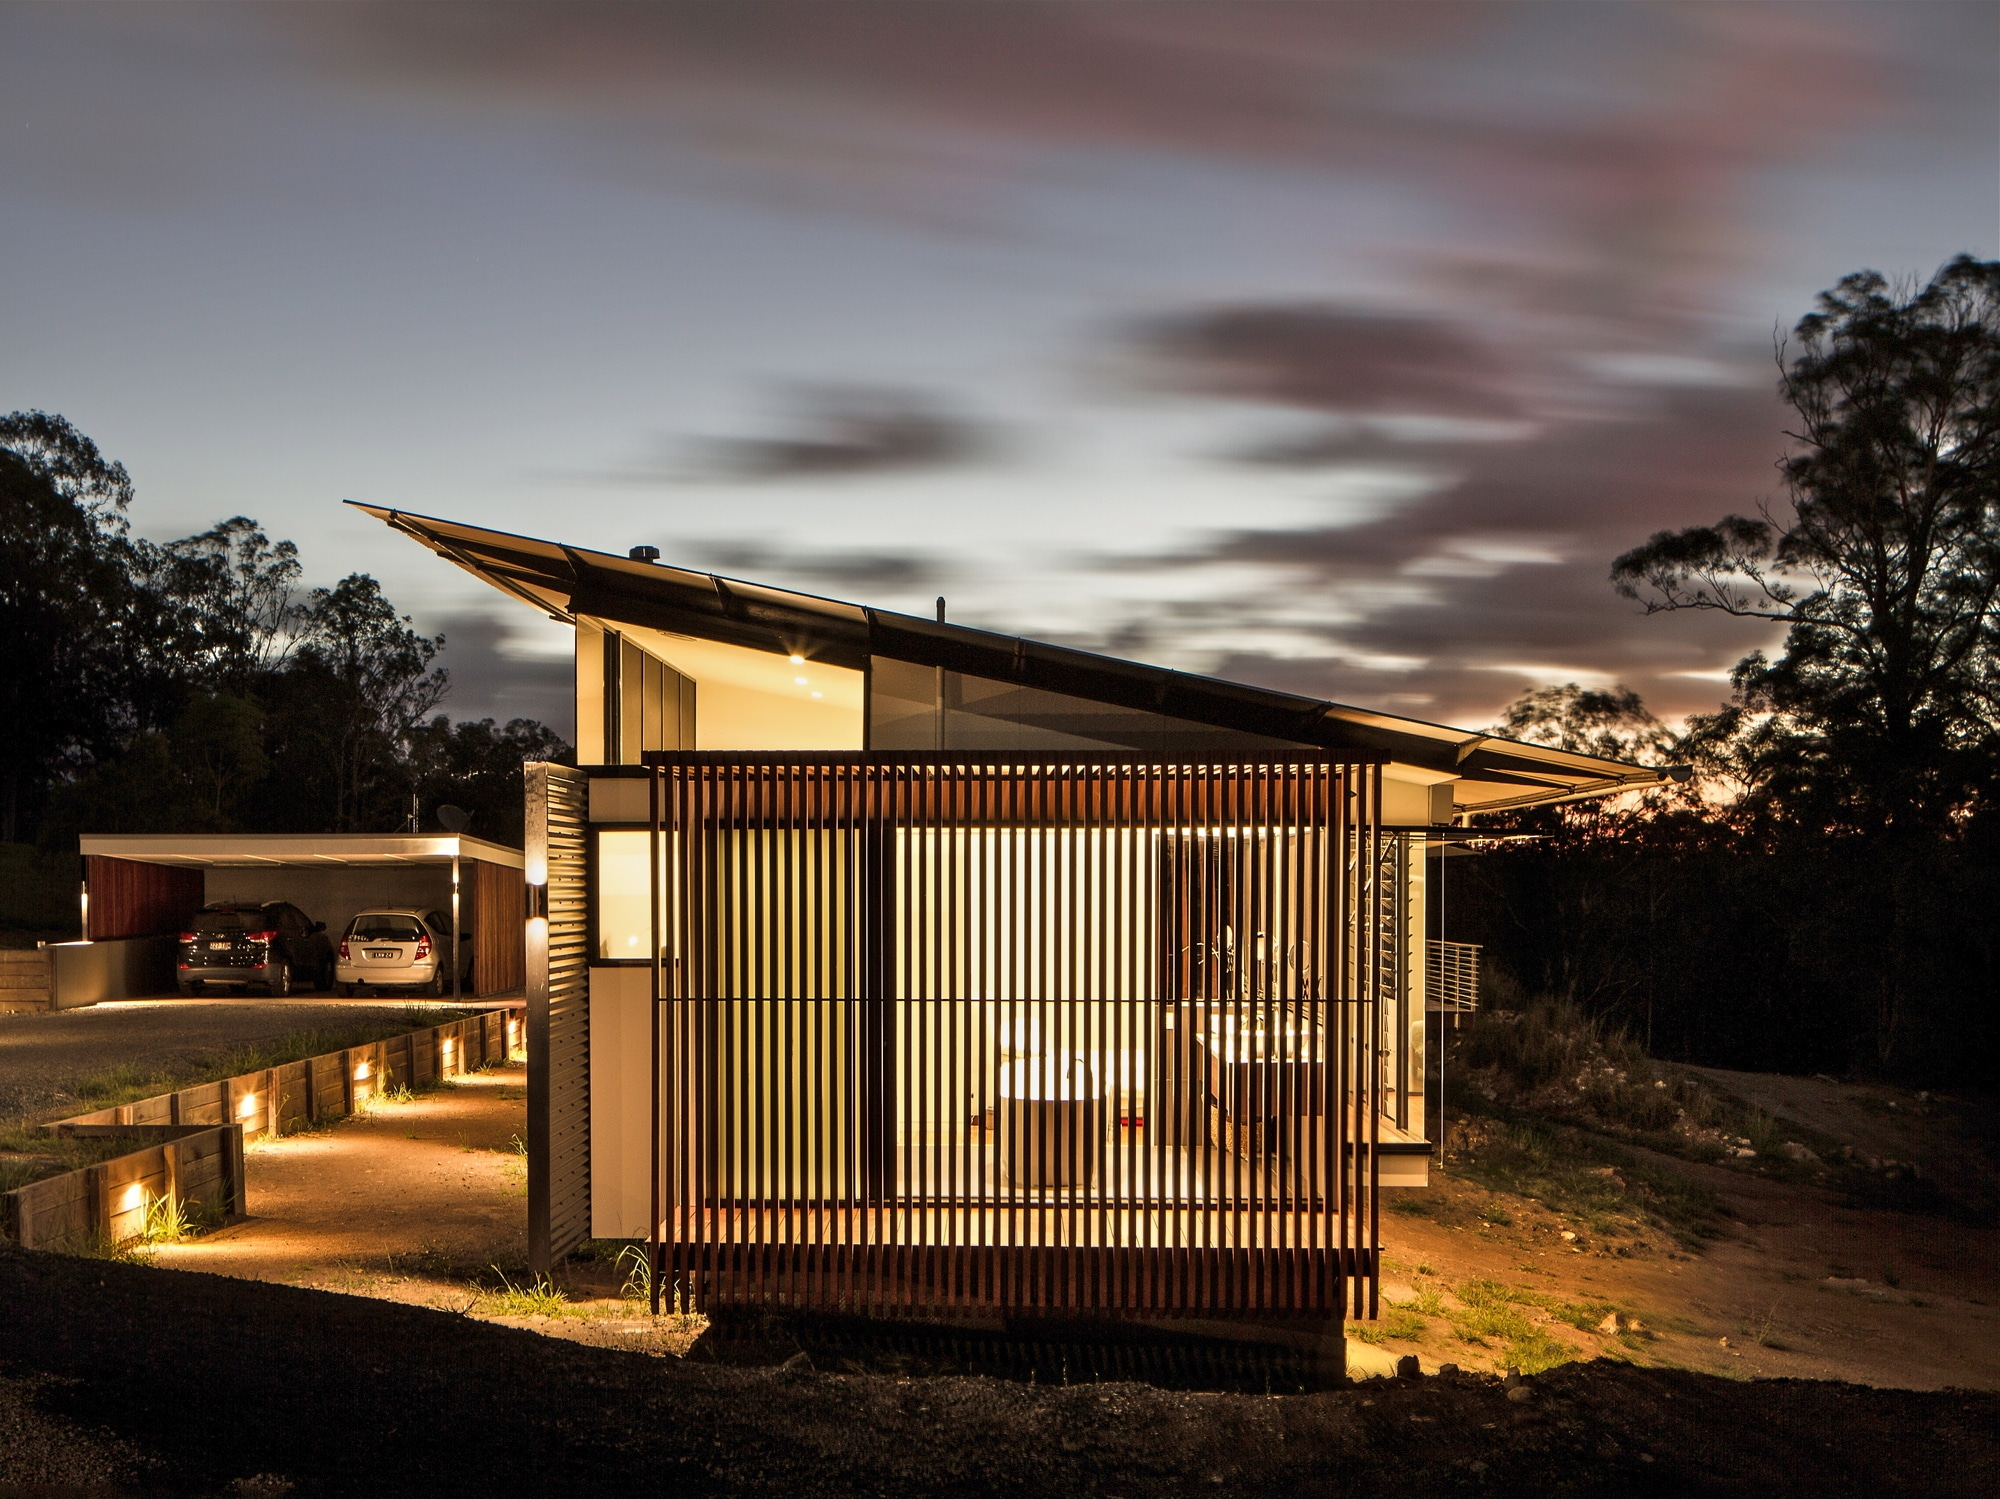 Foto del perfil de la casa alargada de noche : Construye Hogar